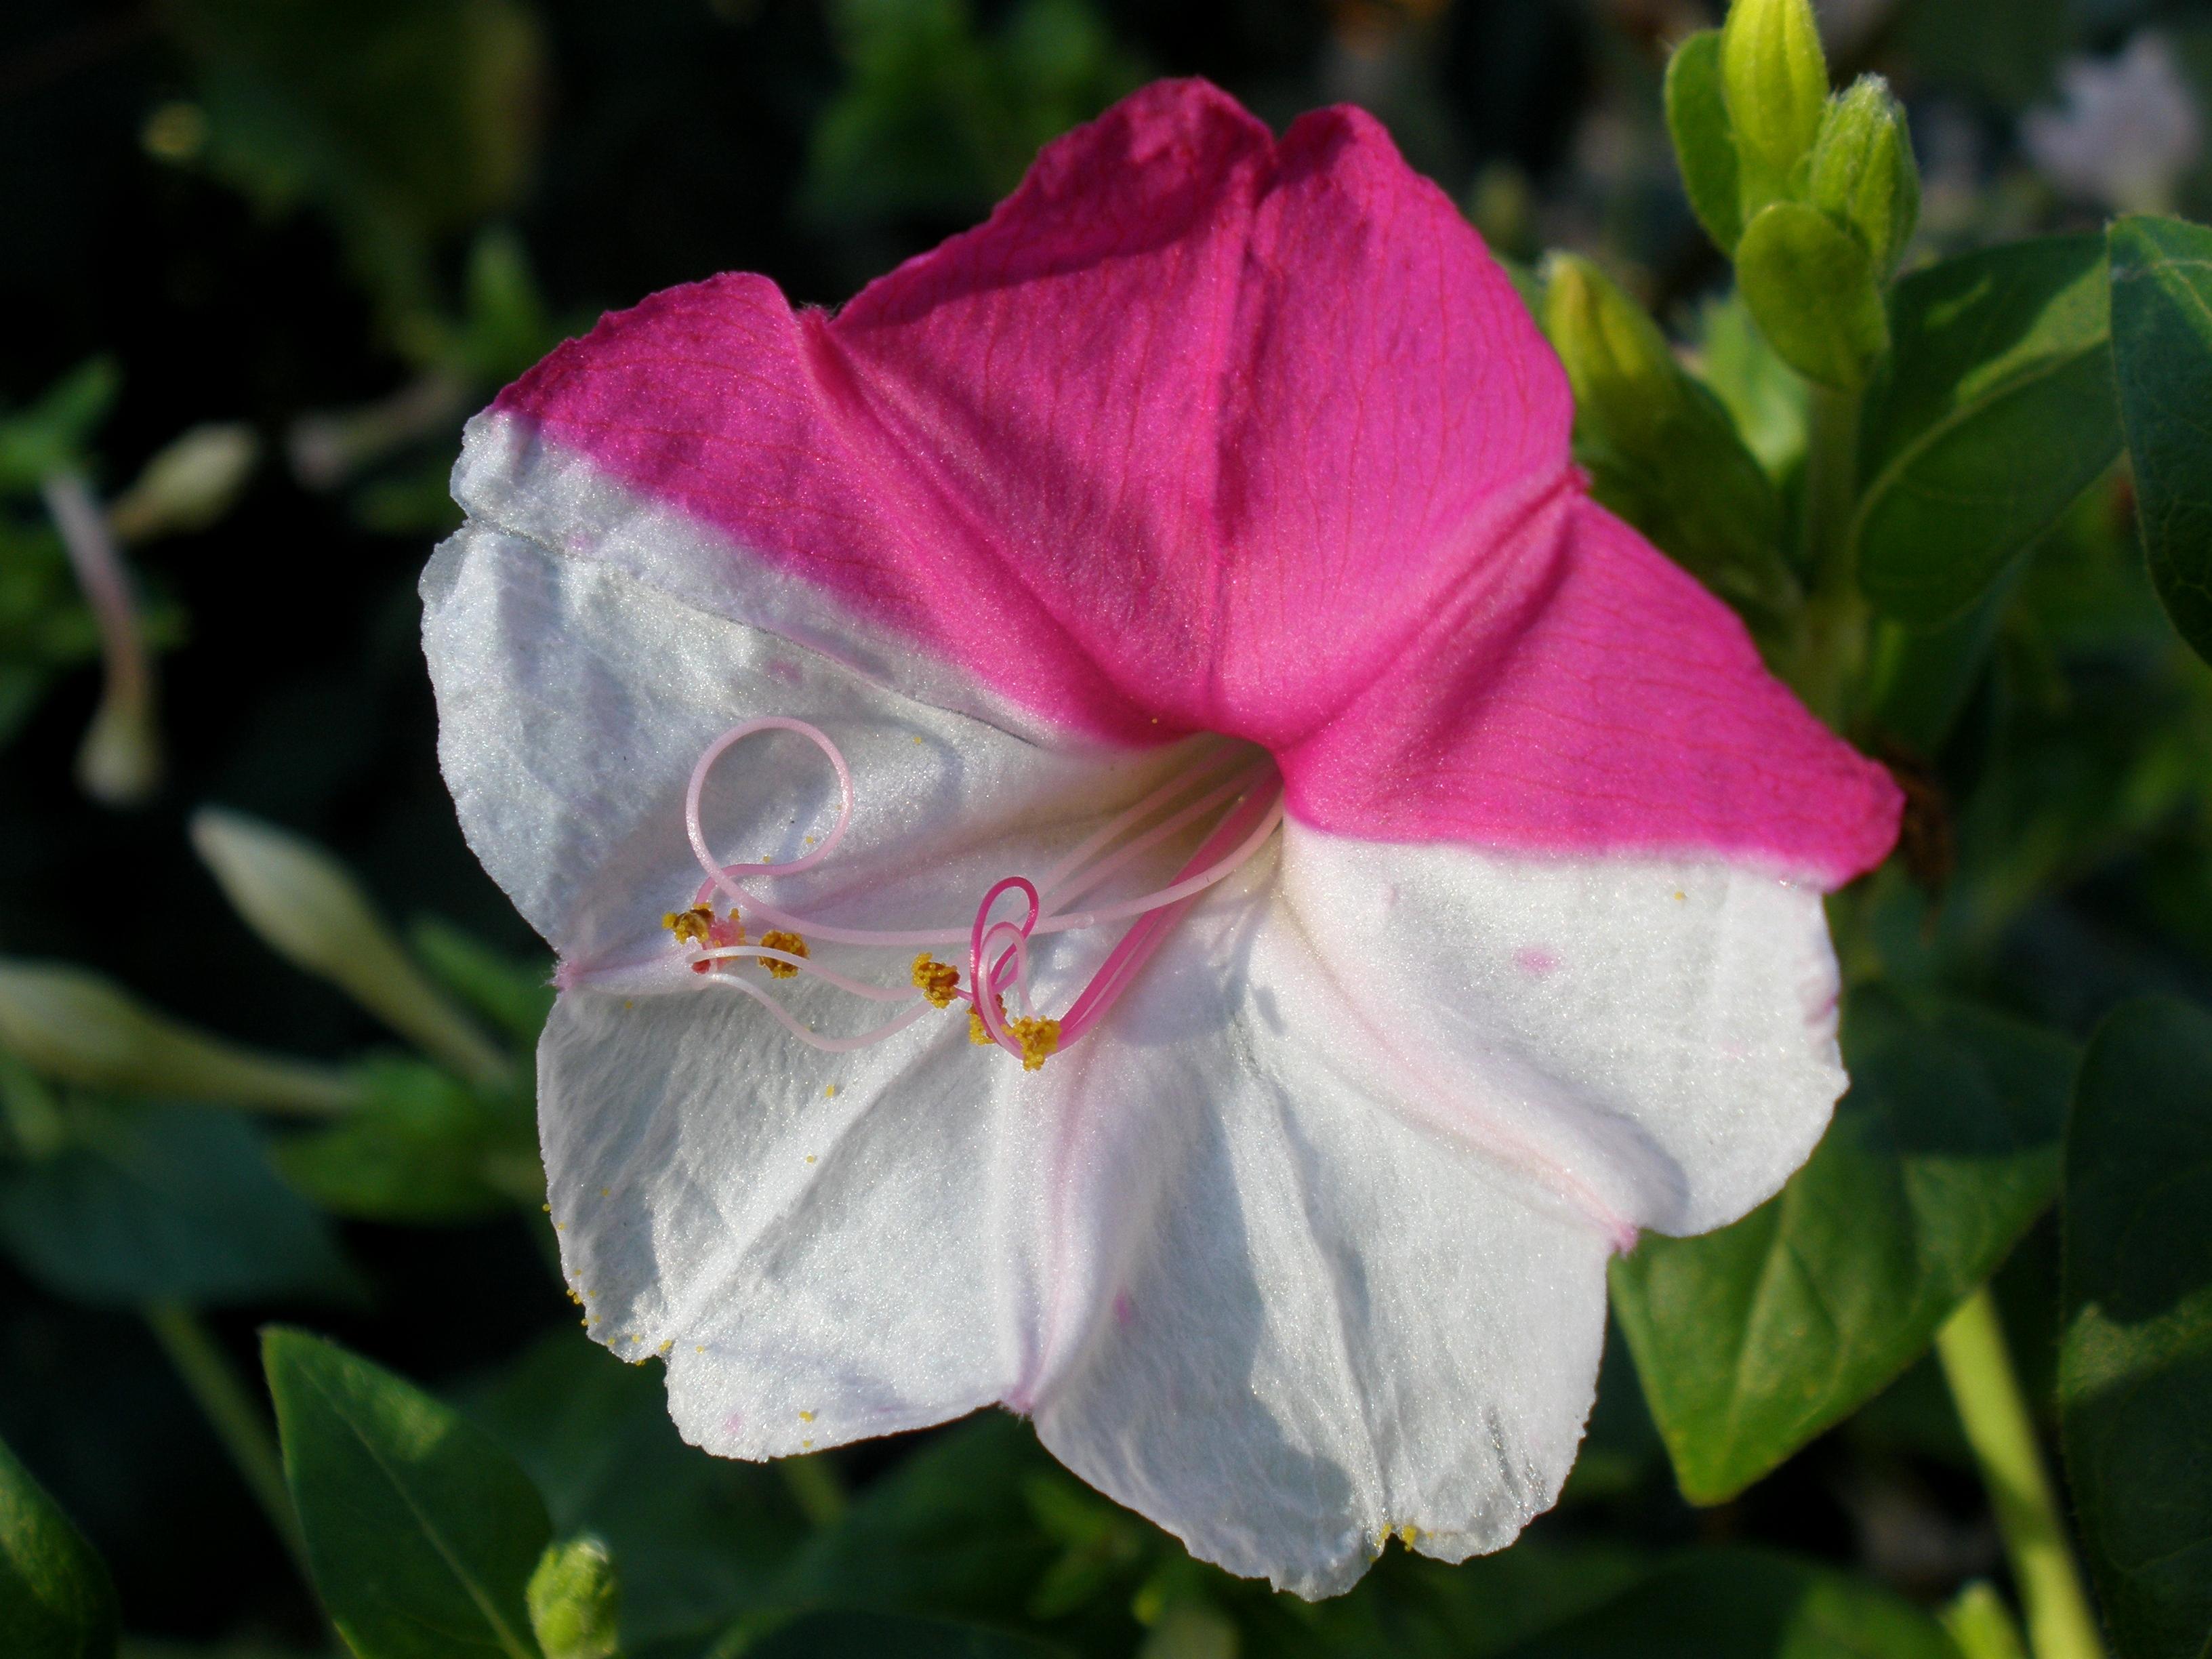 File:Half-white half-purple flower of mirabilis jalapa.jpg ...